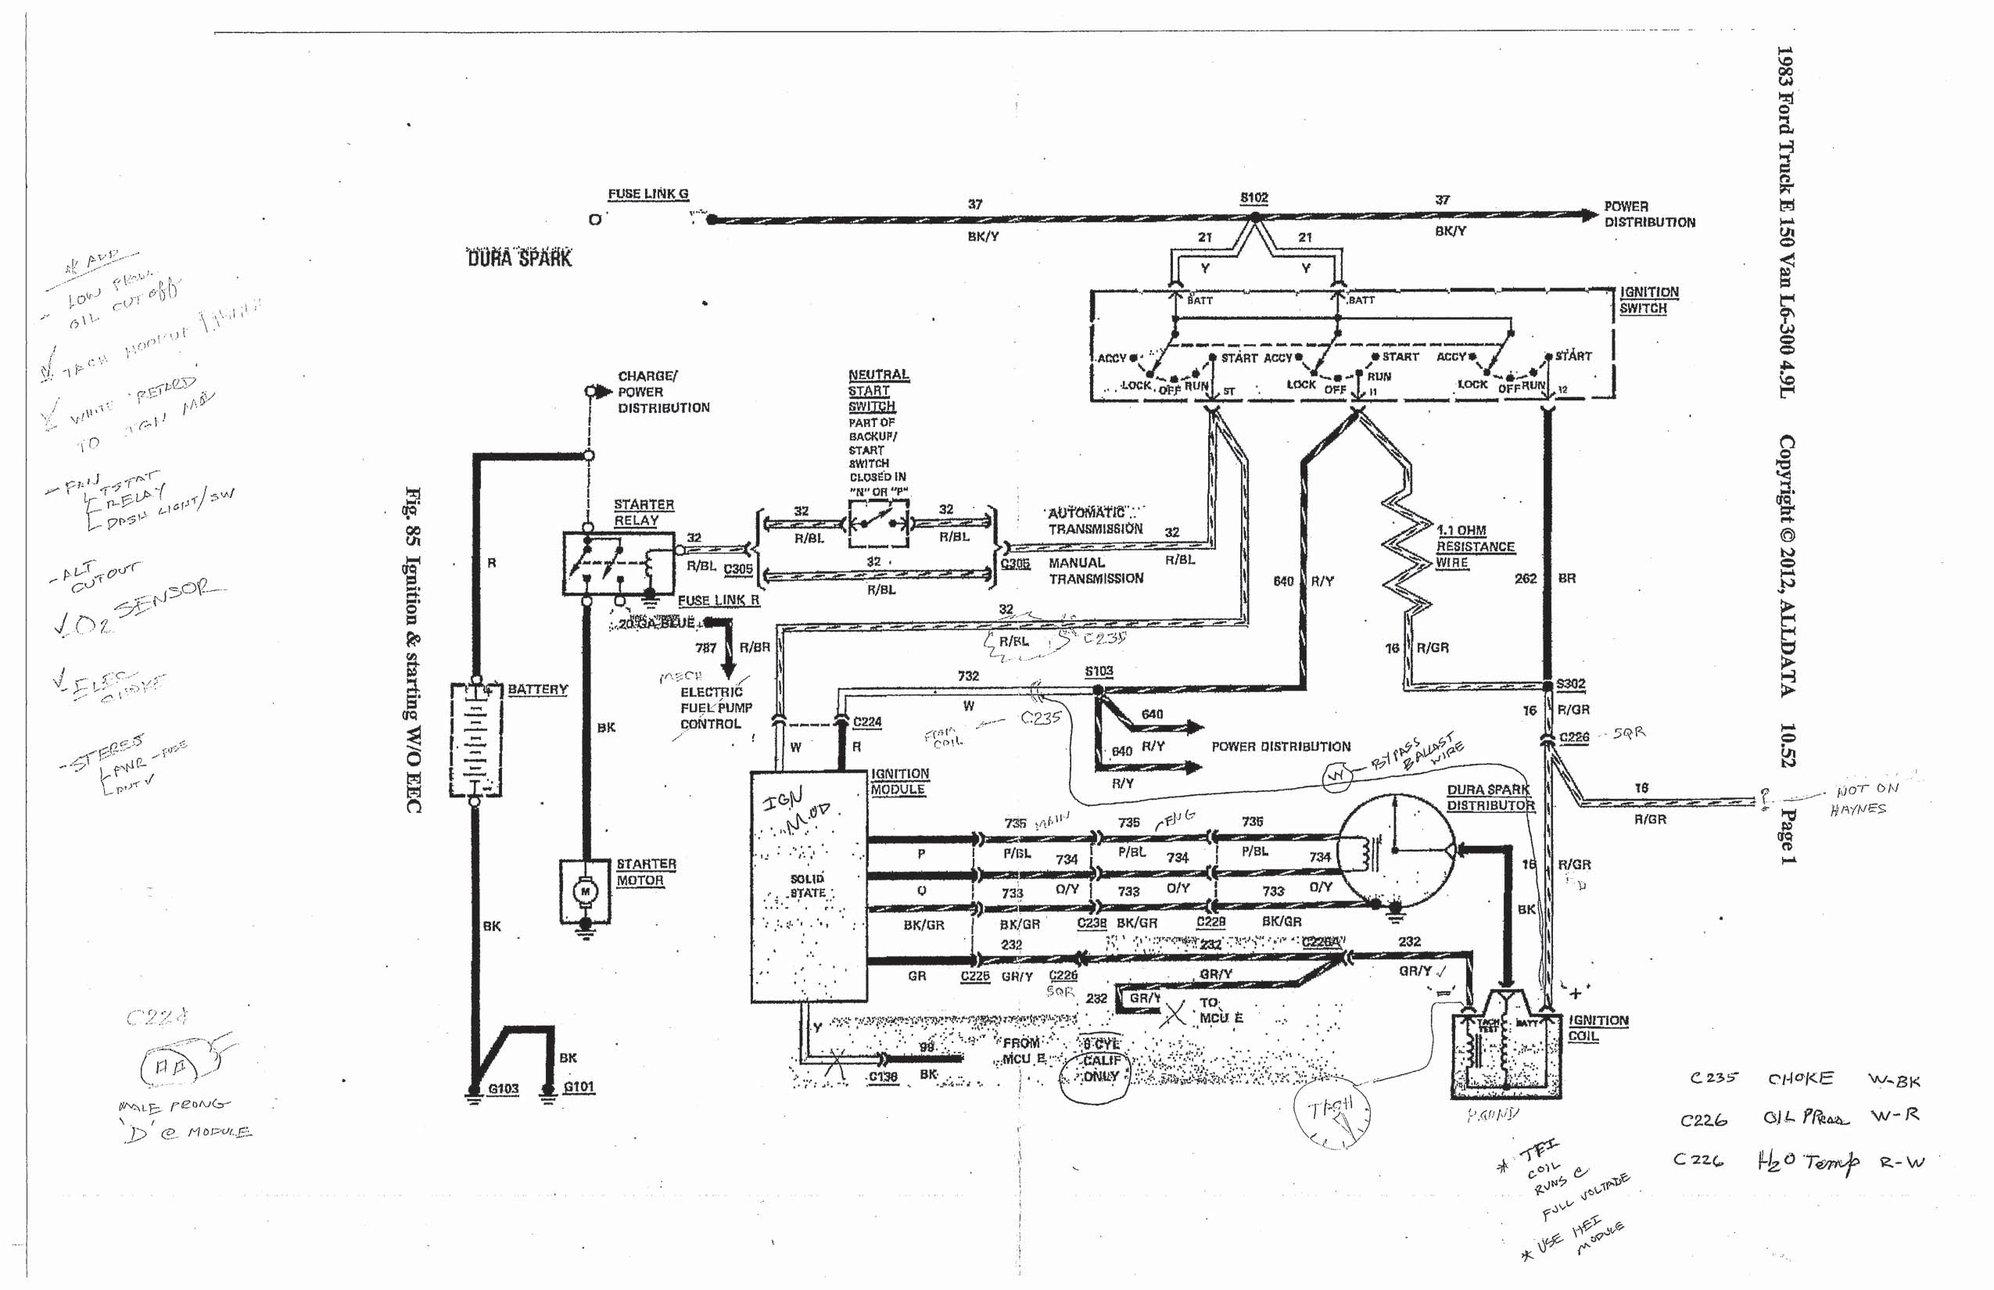 1986 ford econoline wiring diagram - data wiring diagram fat-agree -  fat-agree.vivarelliauto.it  vivarelliauto.it